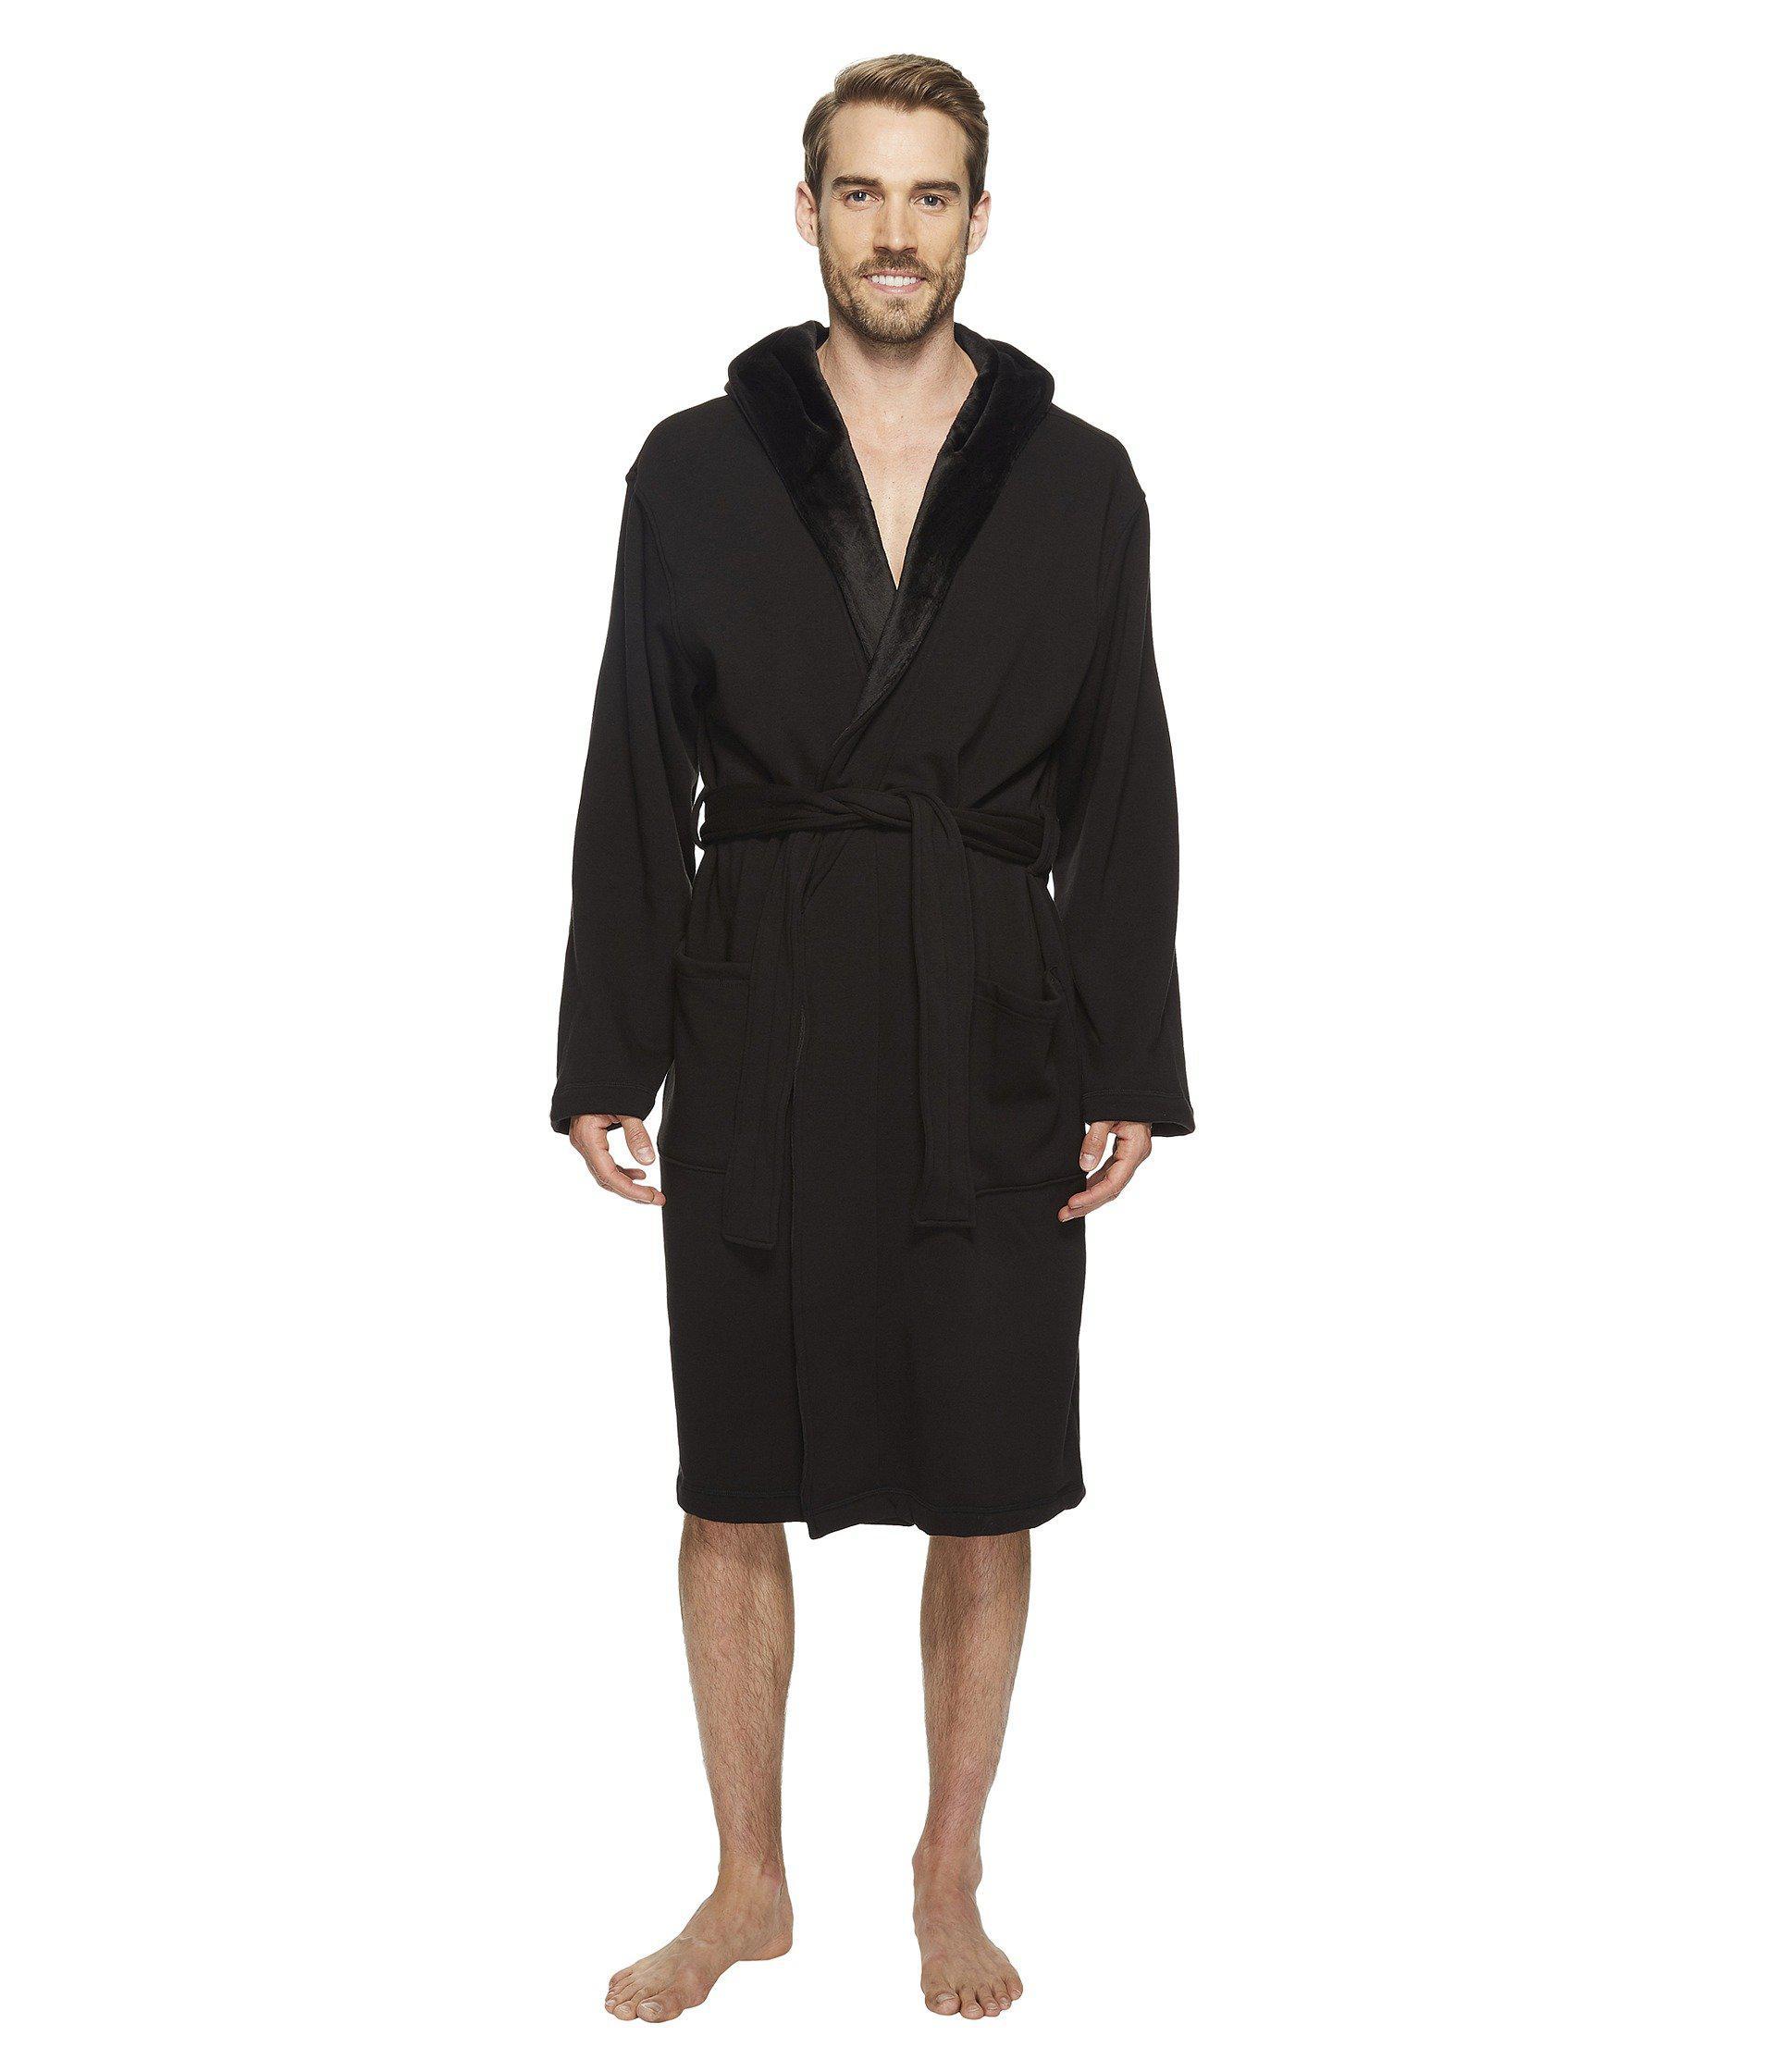 61b2551408 Lyst - UGG Brunswick Robe (rock Ridge Heather) Men s Robe in Black ...